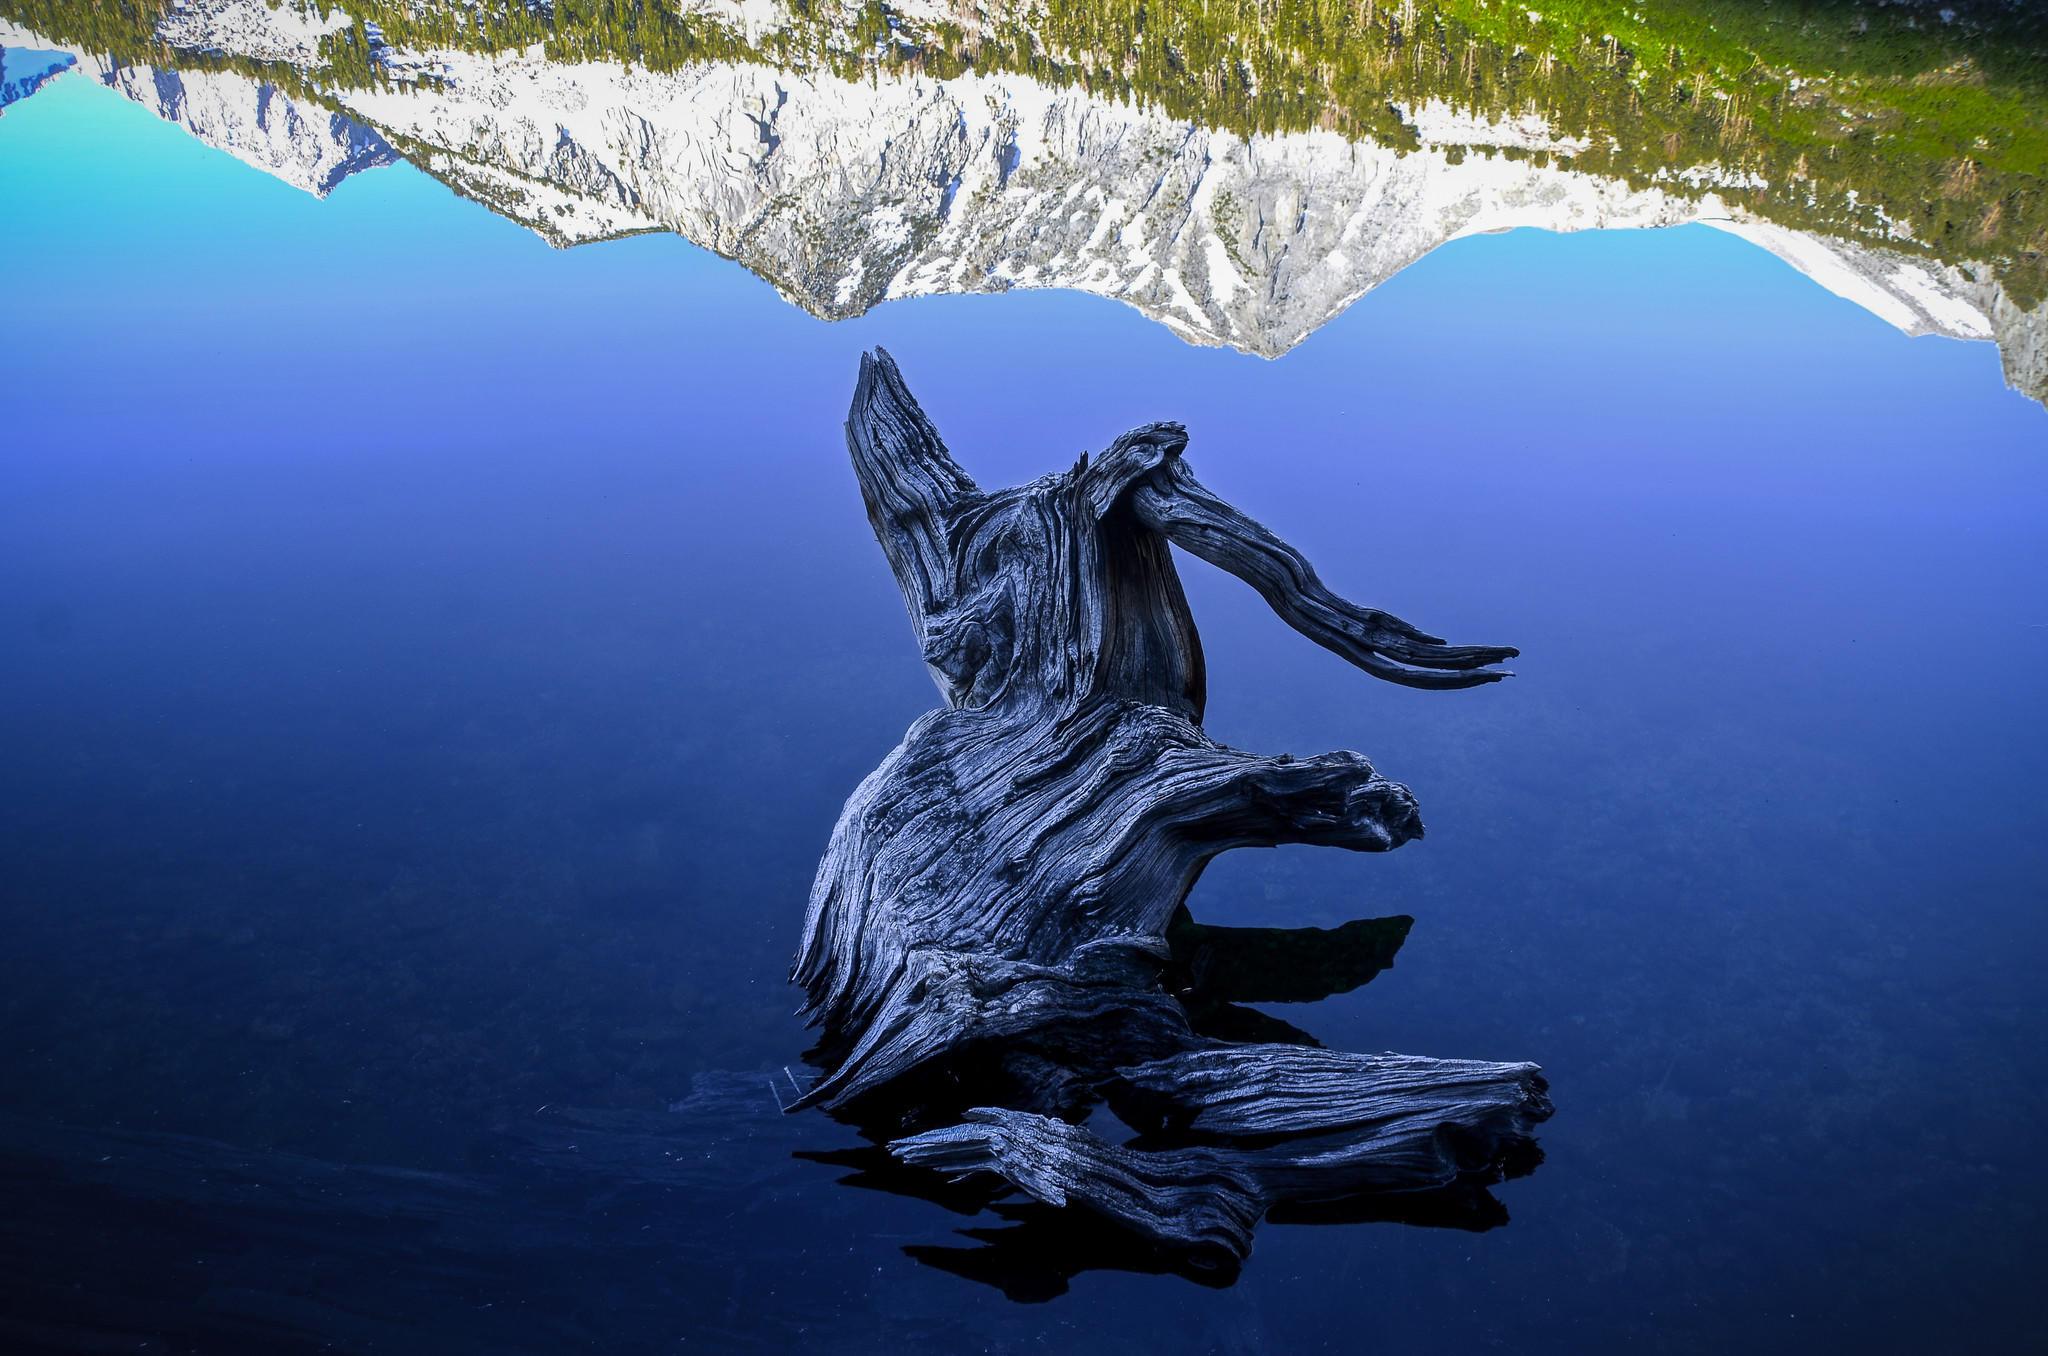 How a tenderfoot's horse trek in the Sierra showed him the